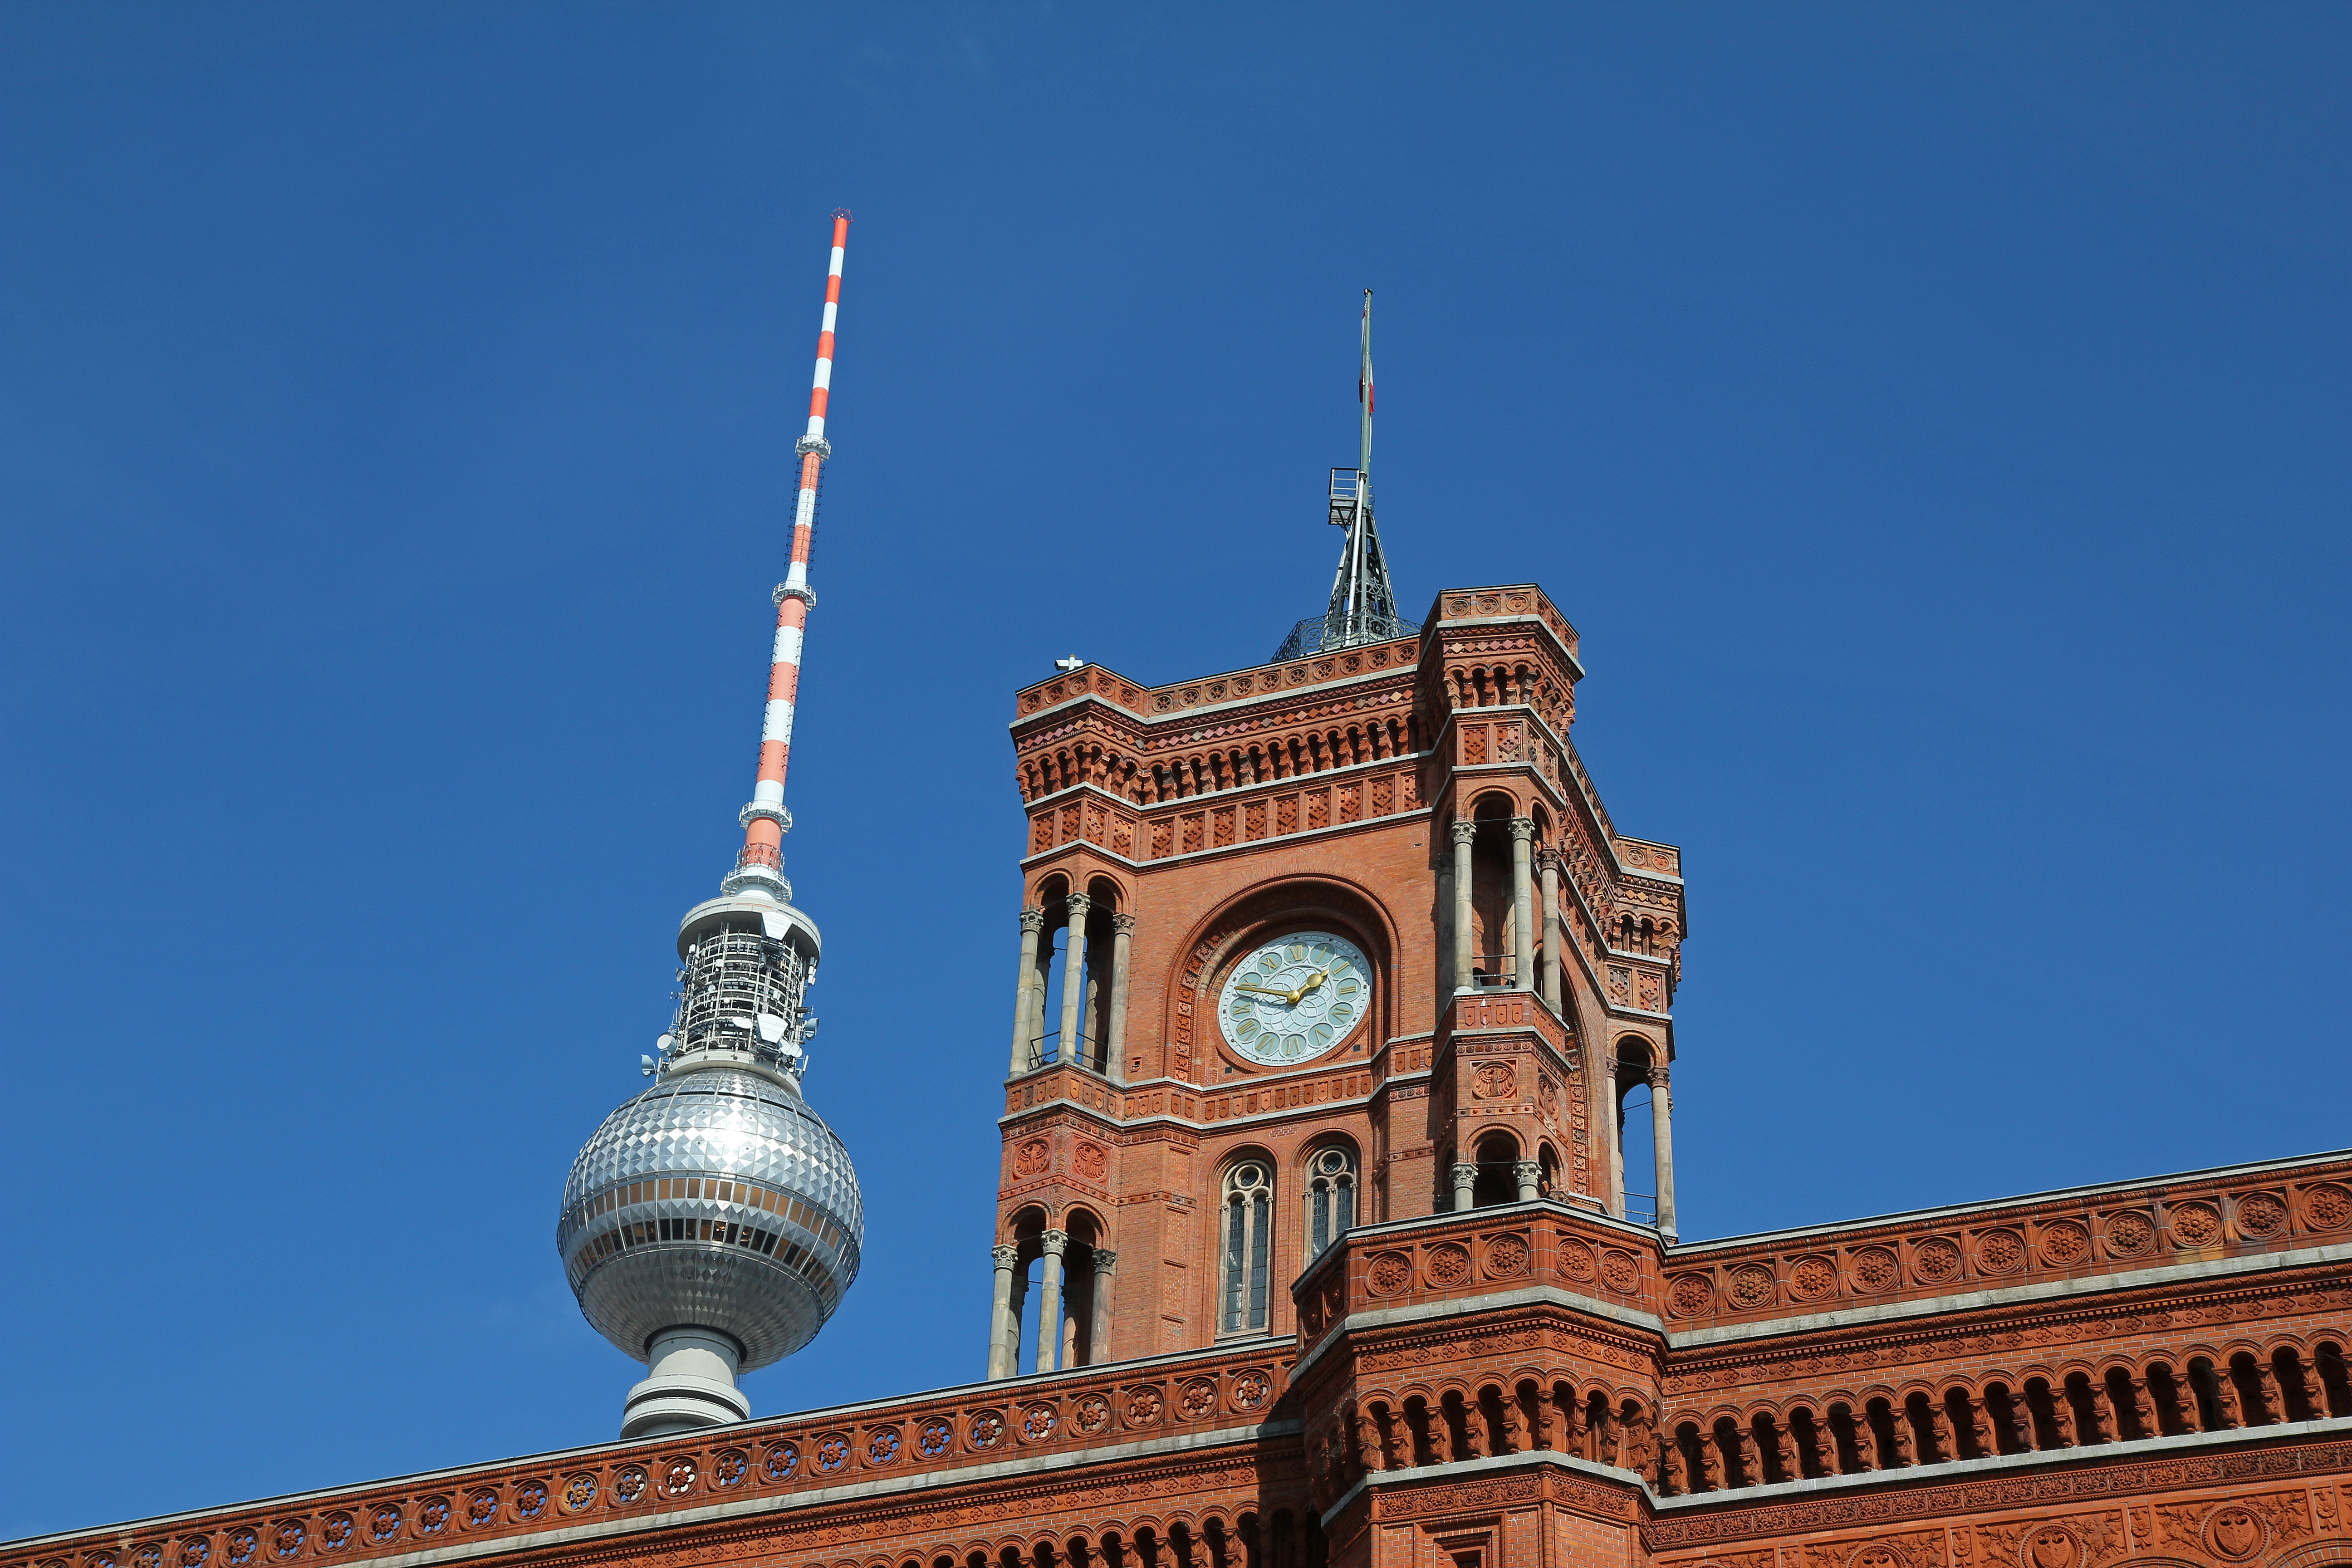 reddit-top-2.5-million/berlin.csv at master · umbrae/reddit-top-2.5 ...